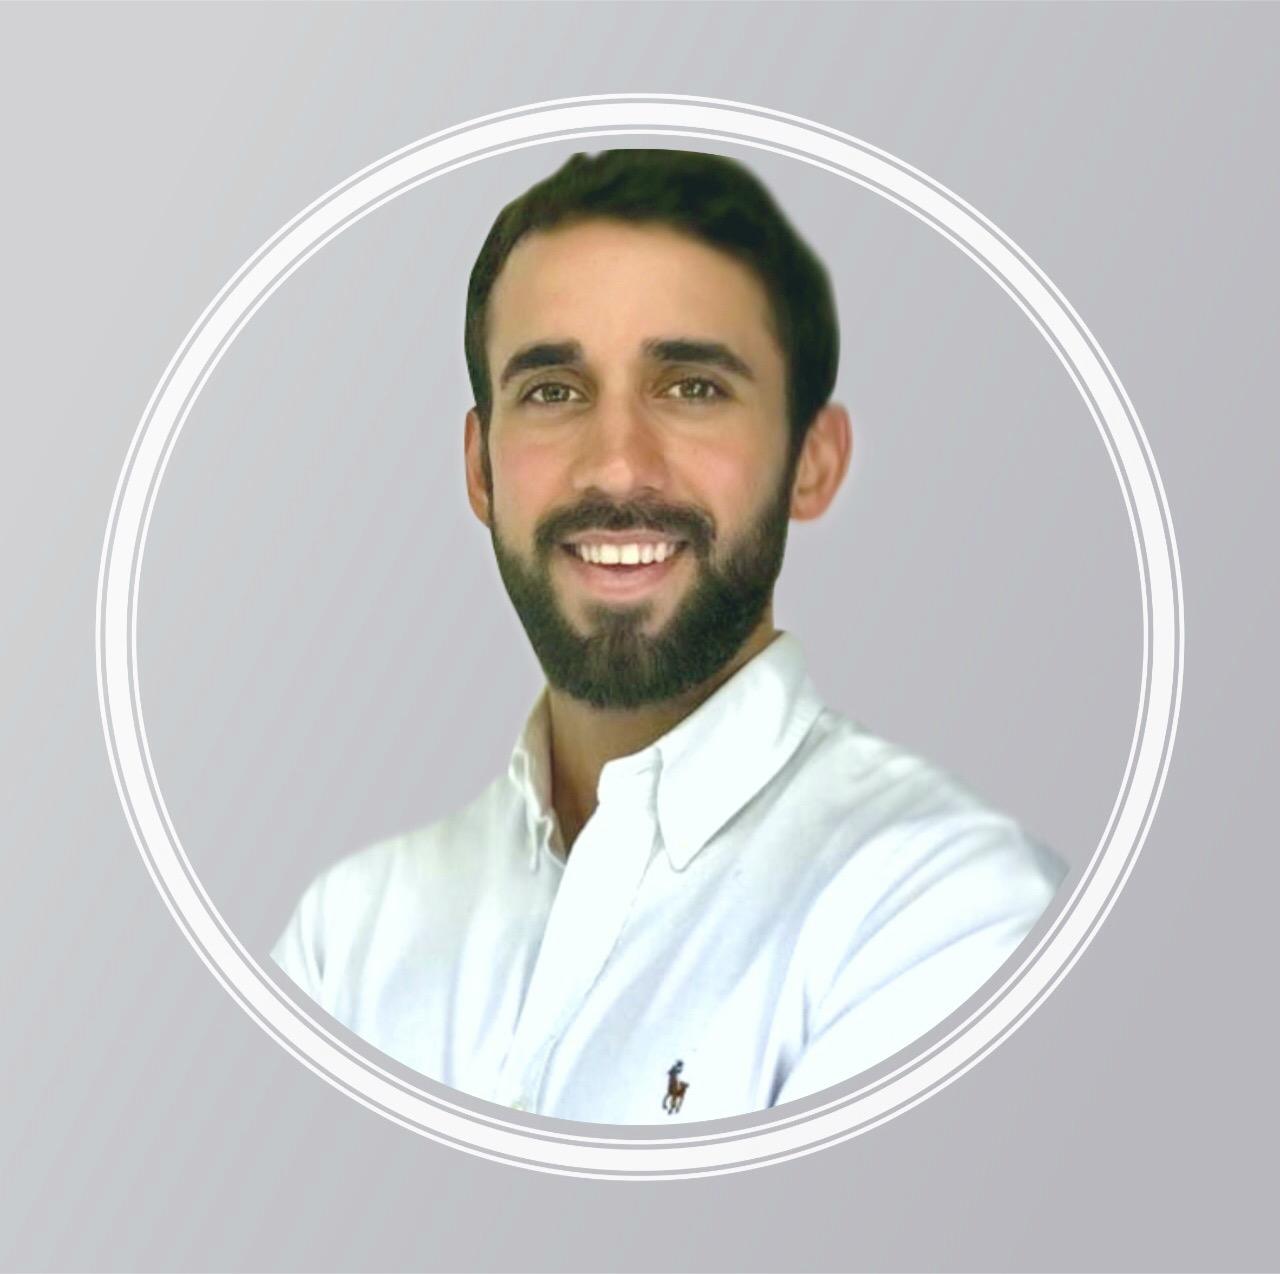 Alejandro Penzini